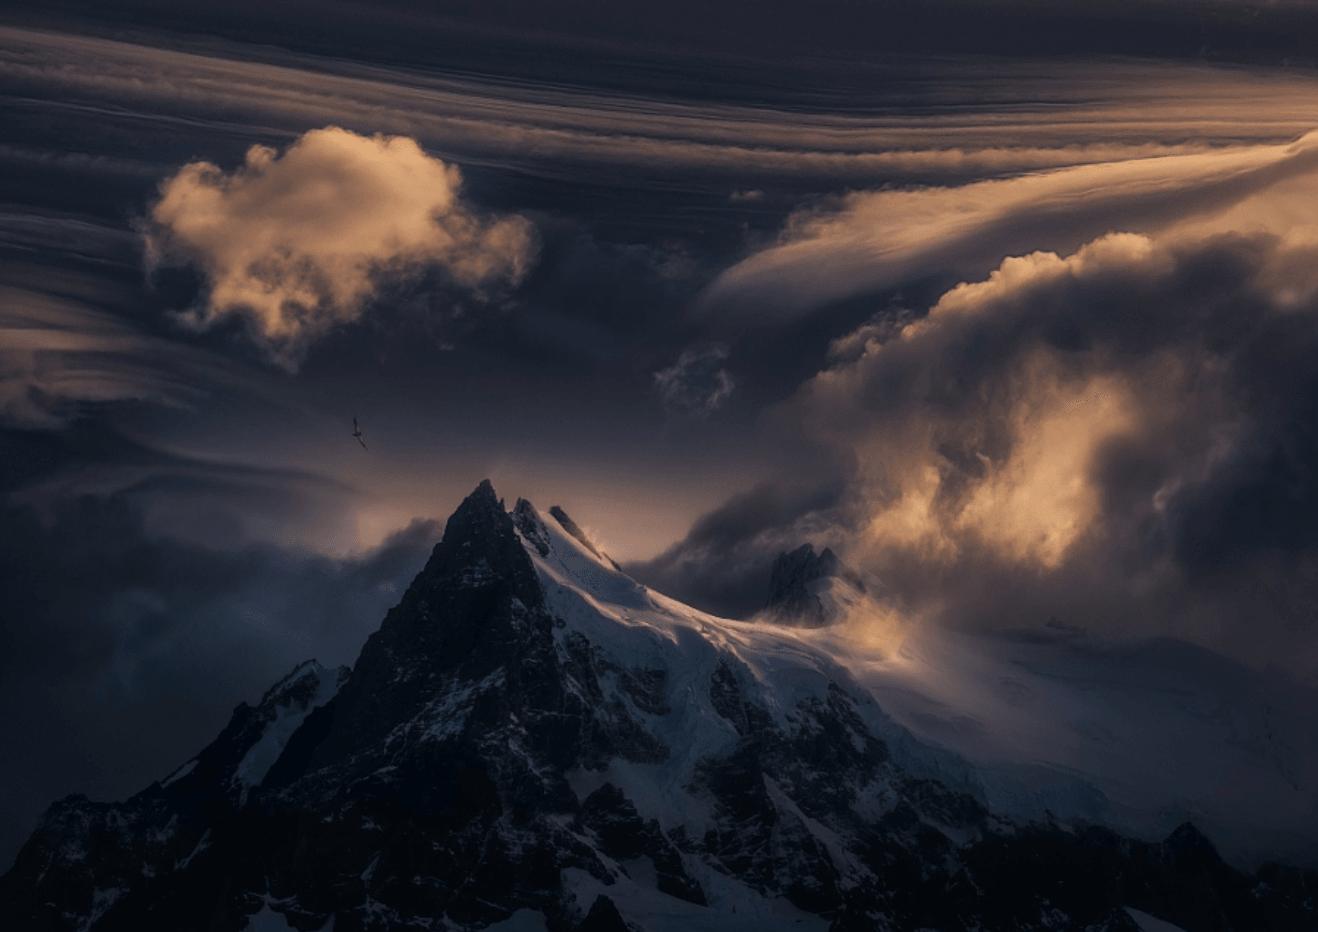 For Eternity by Marc Adamus